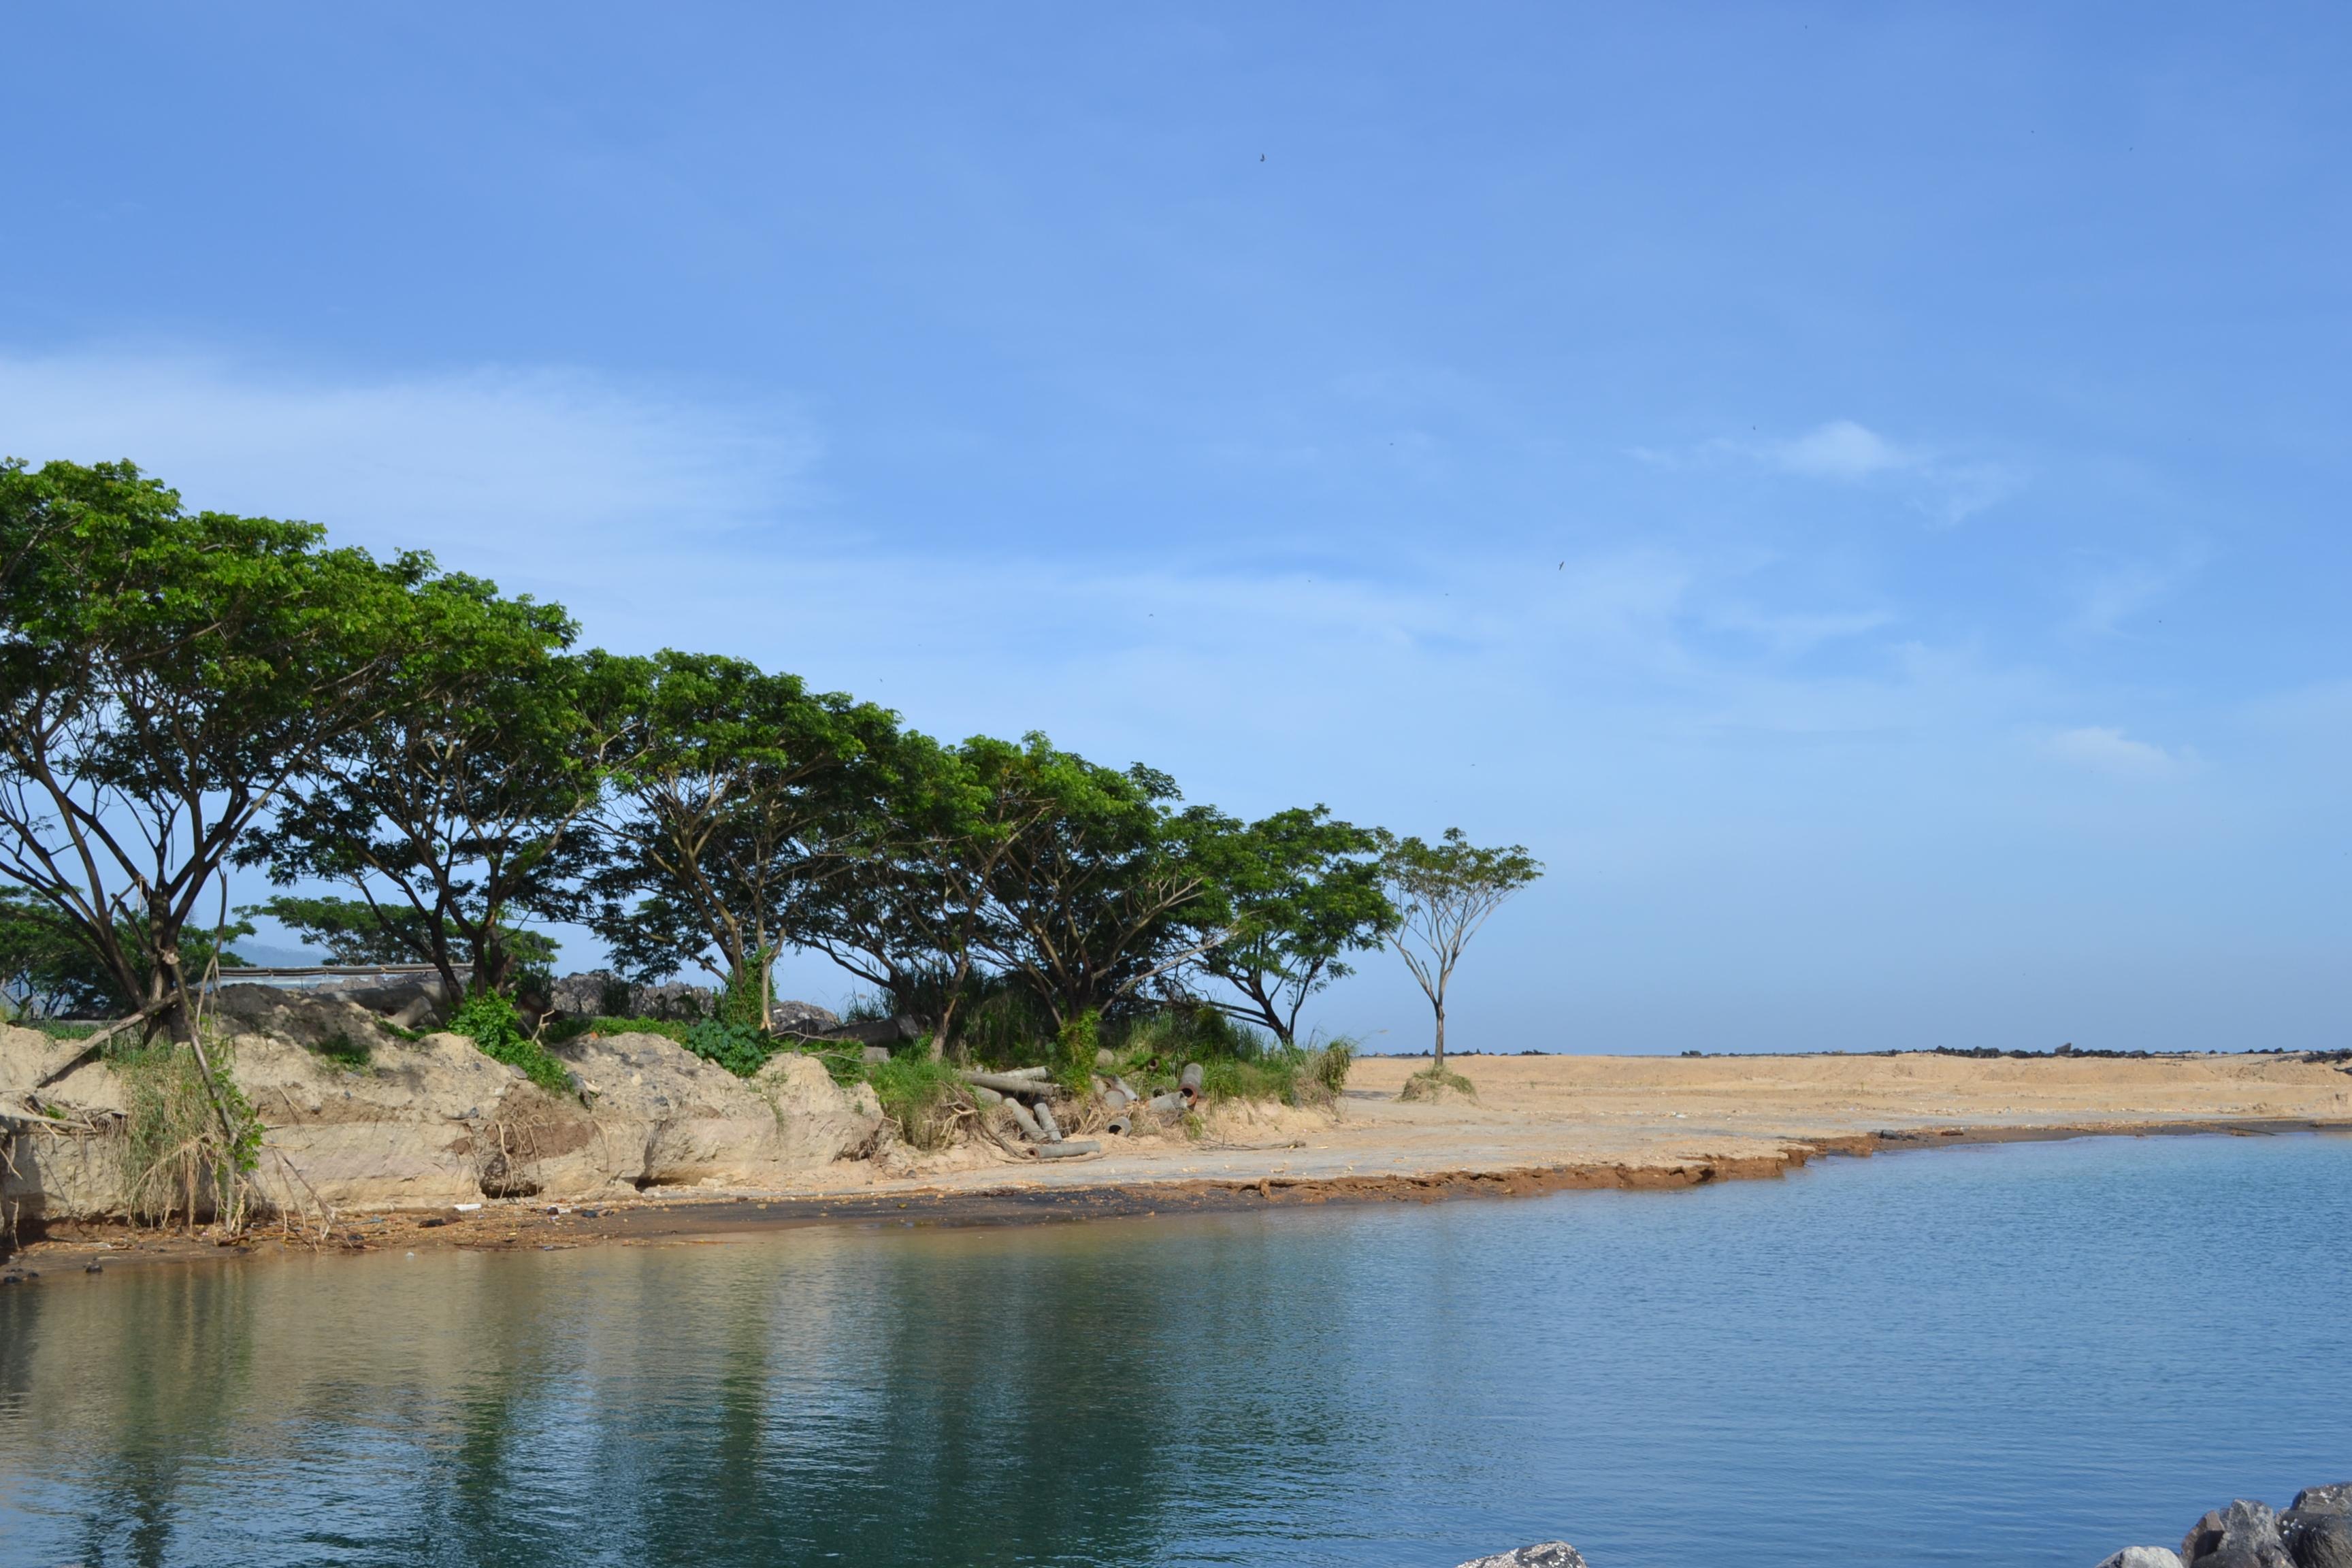 Trees at the beach photo